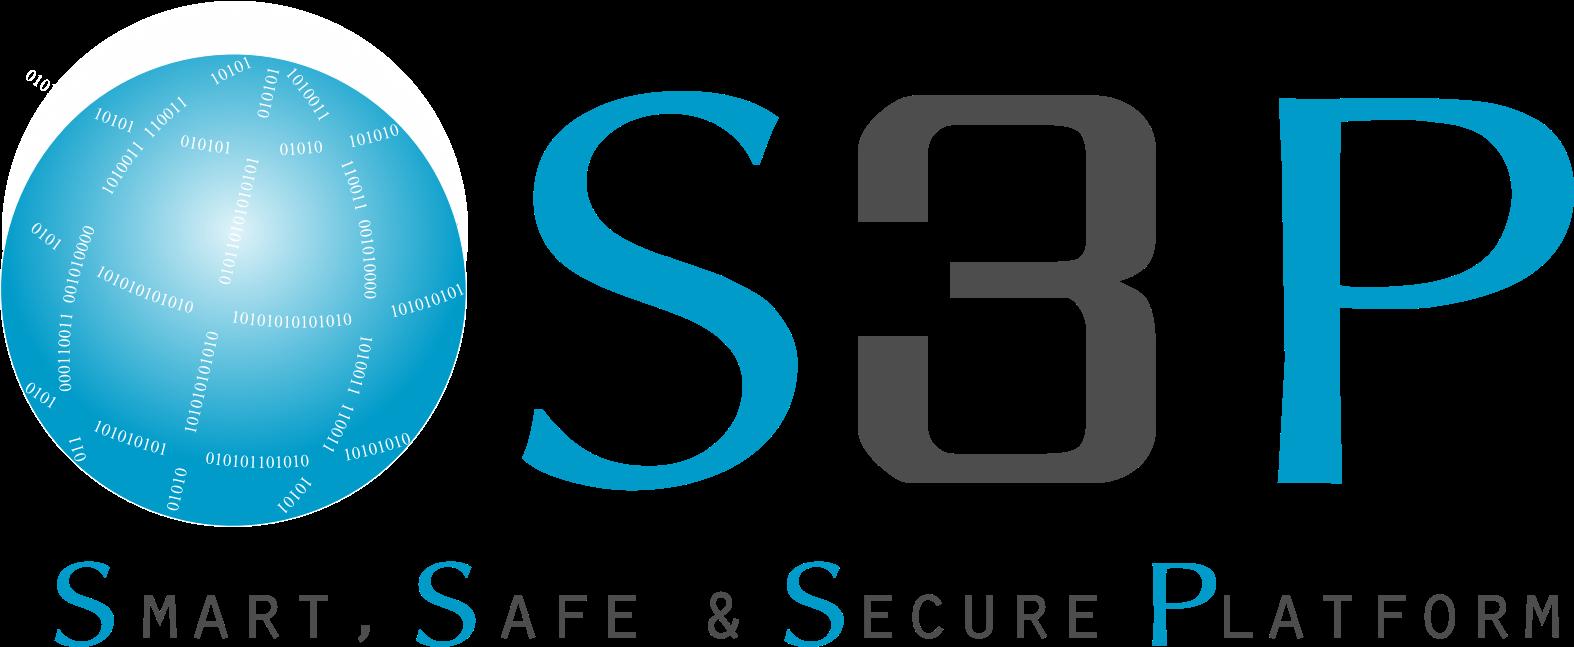 S3P_logo